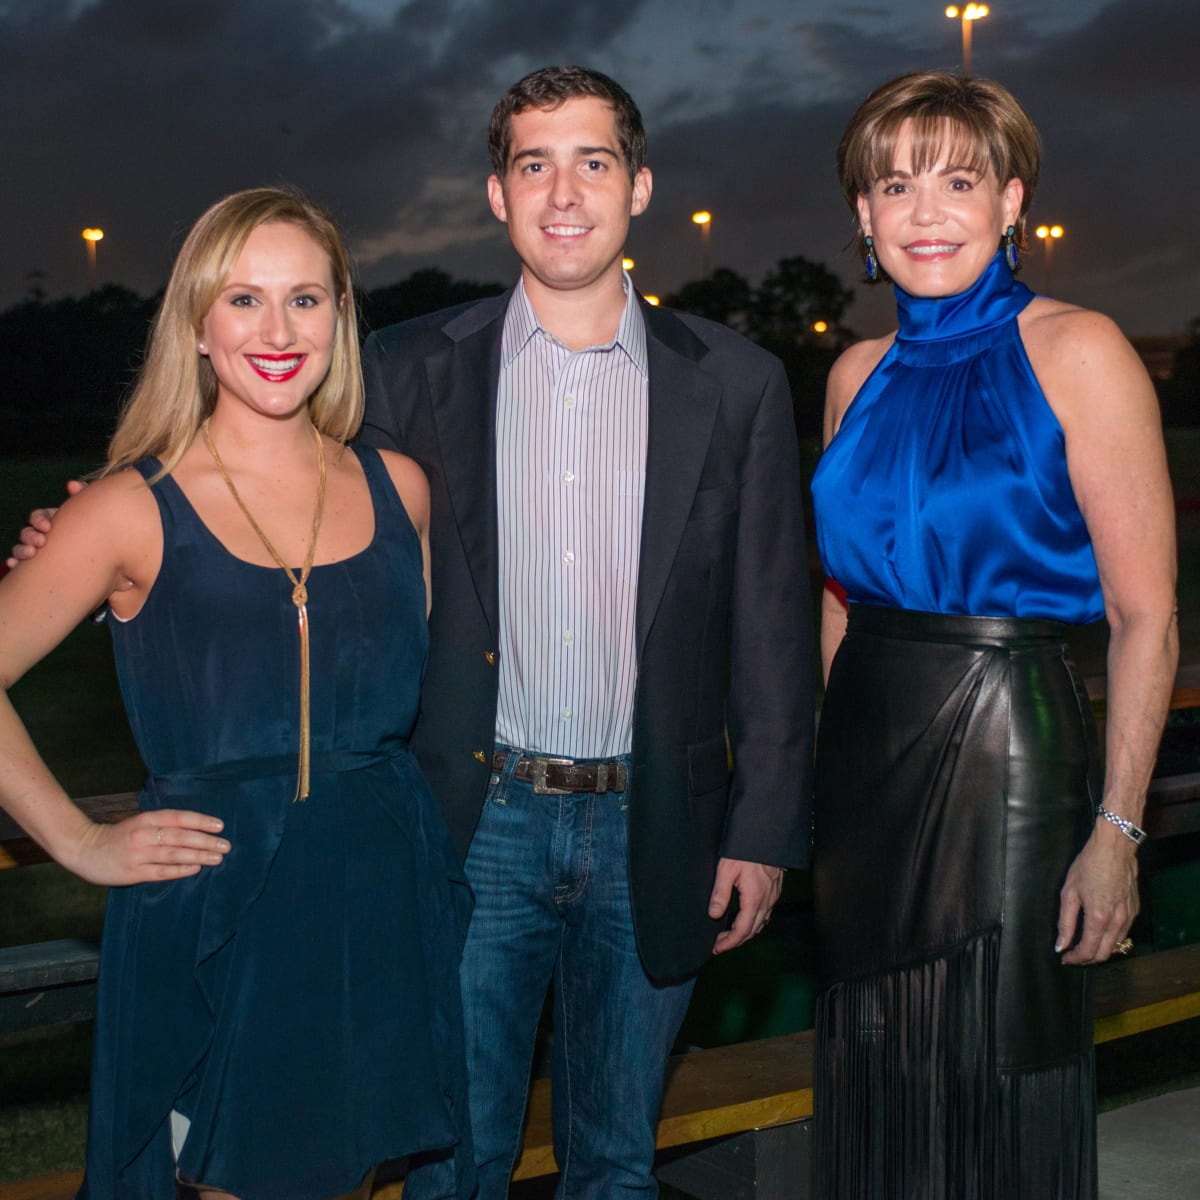 News, Shelby, Nature Conservancy gala, Oct. 2015, Sydney Vanderhider, Michael Vanderhider, Hallie Vanderhider